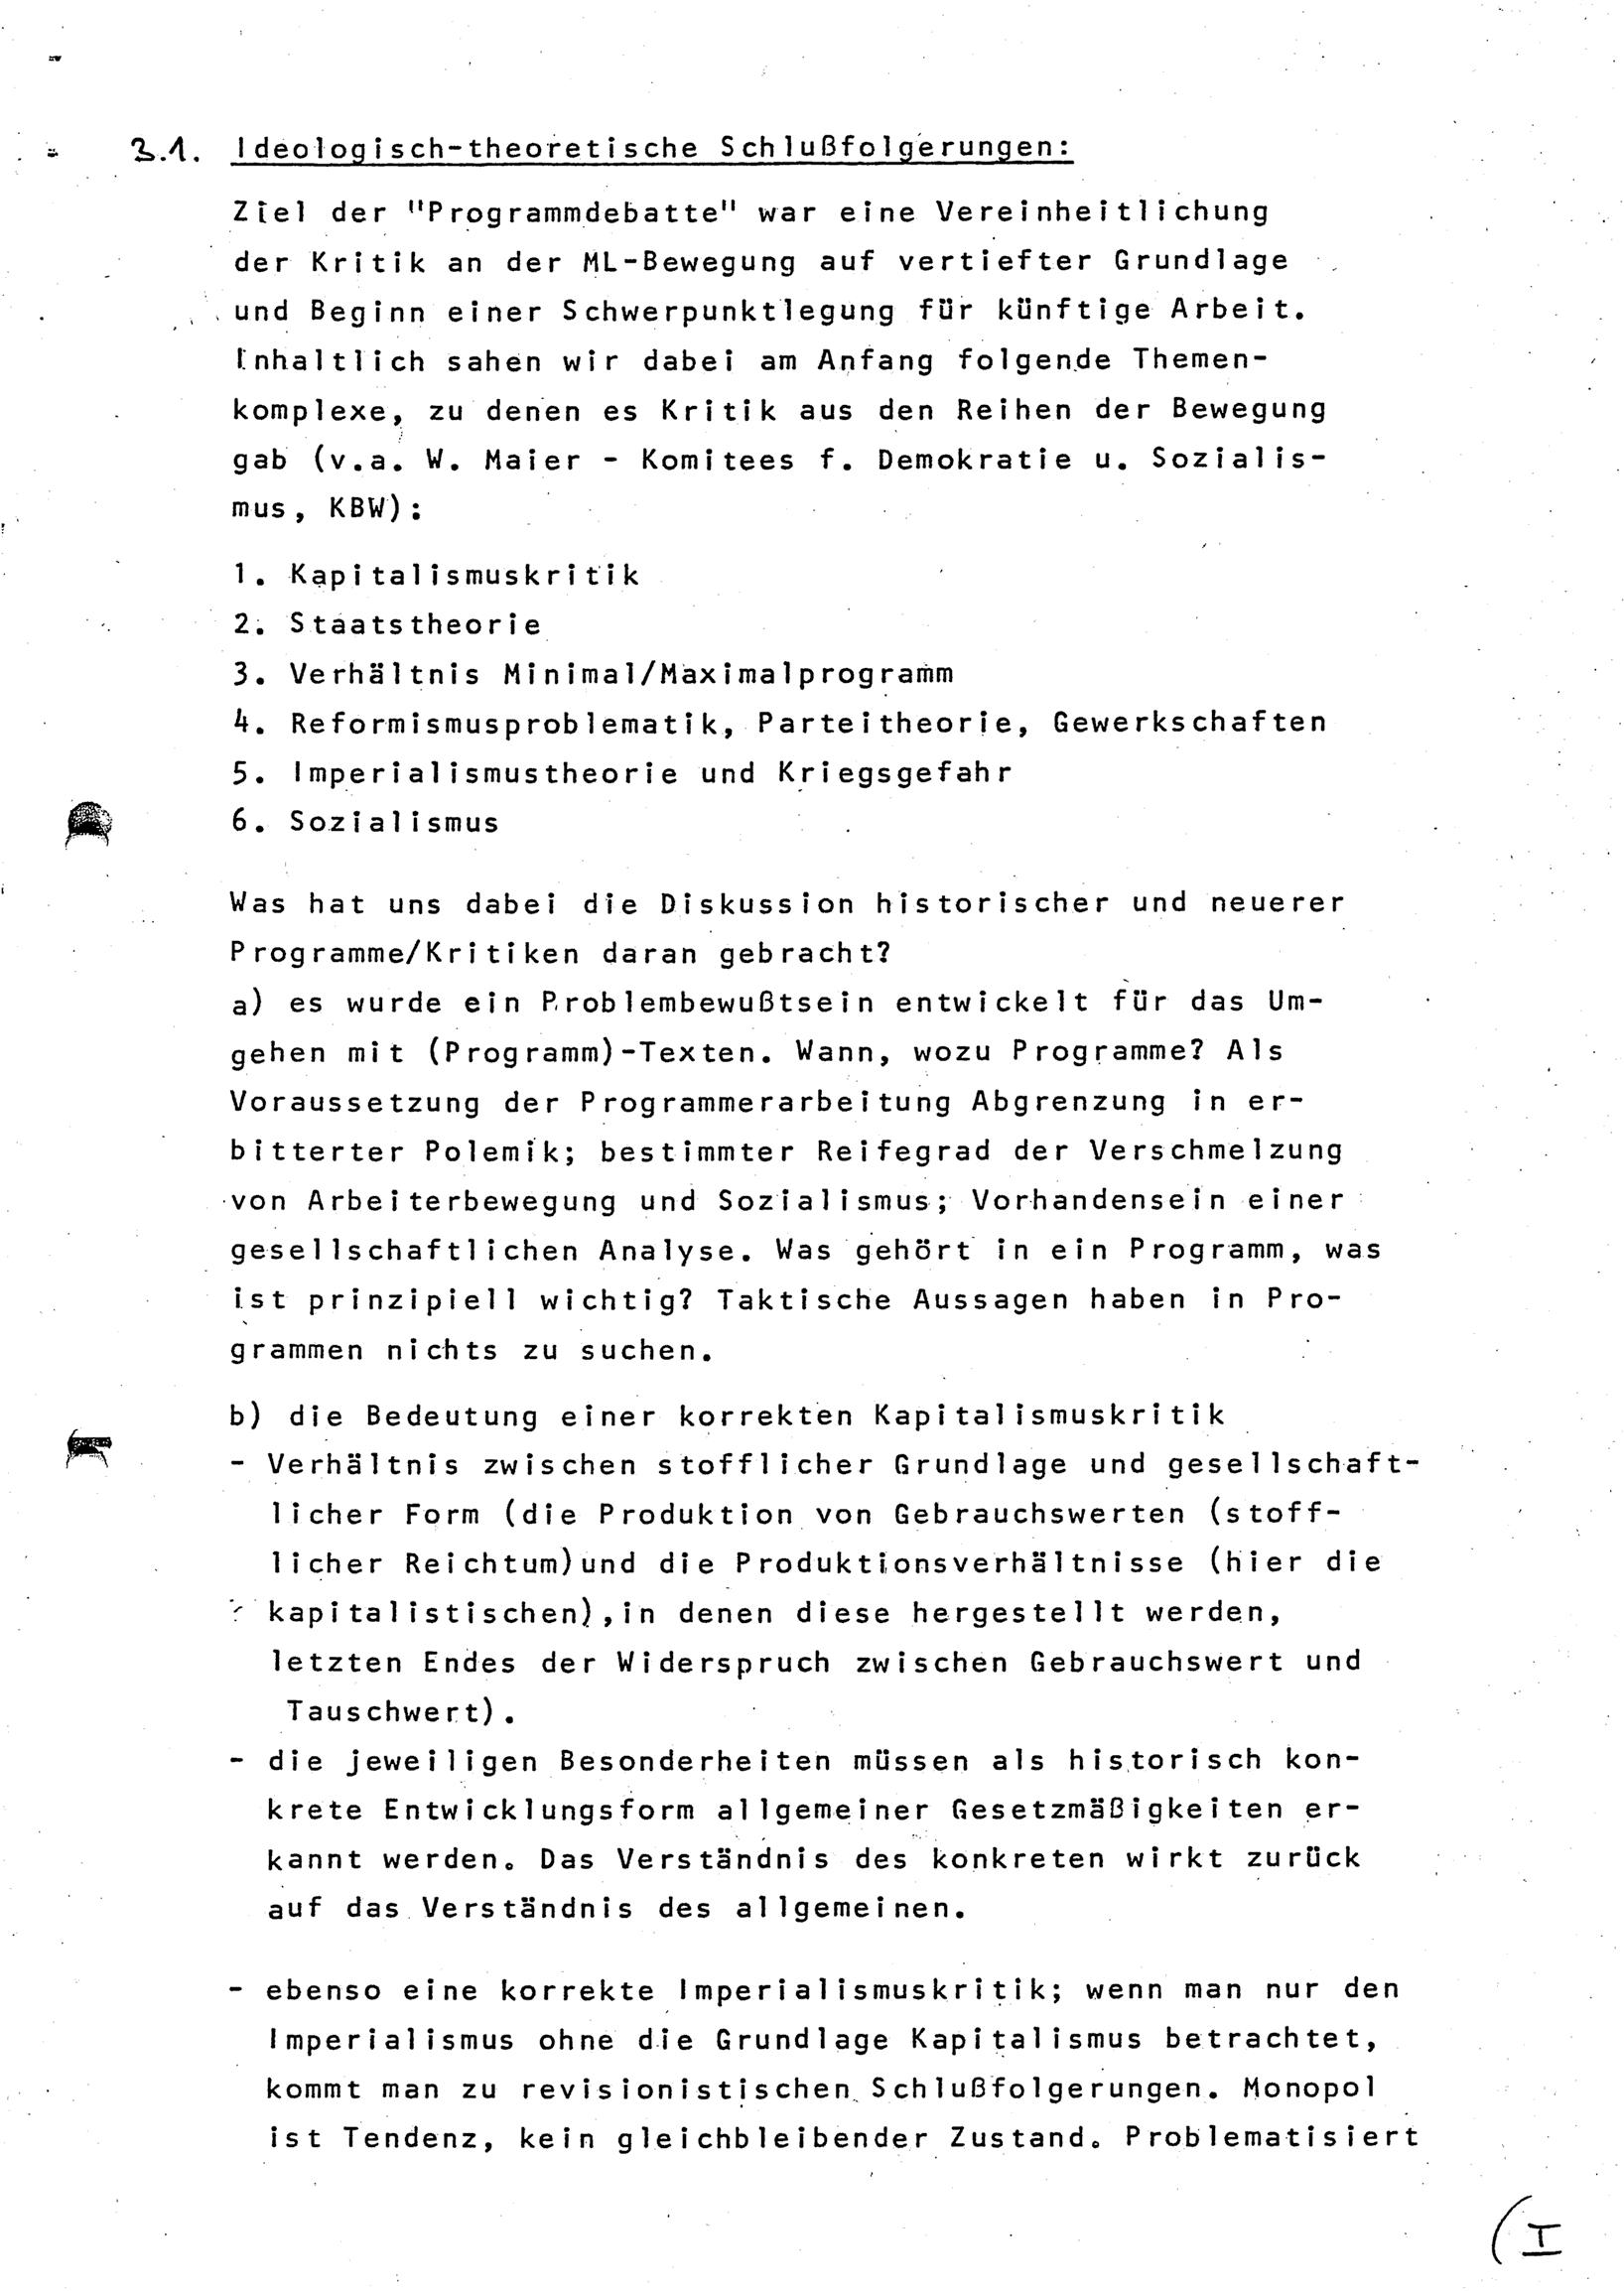 Ulm_KGU_Arbeitsheft_19830425_015_061